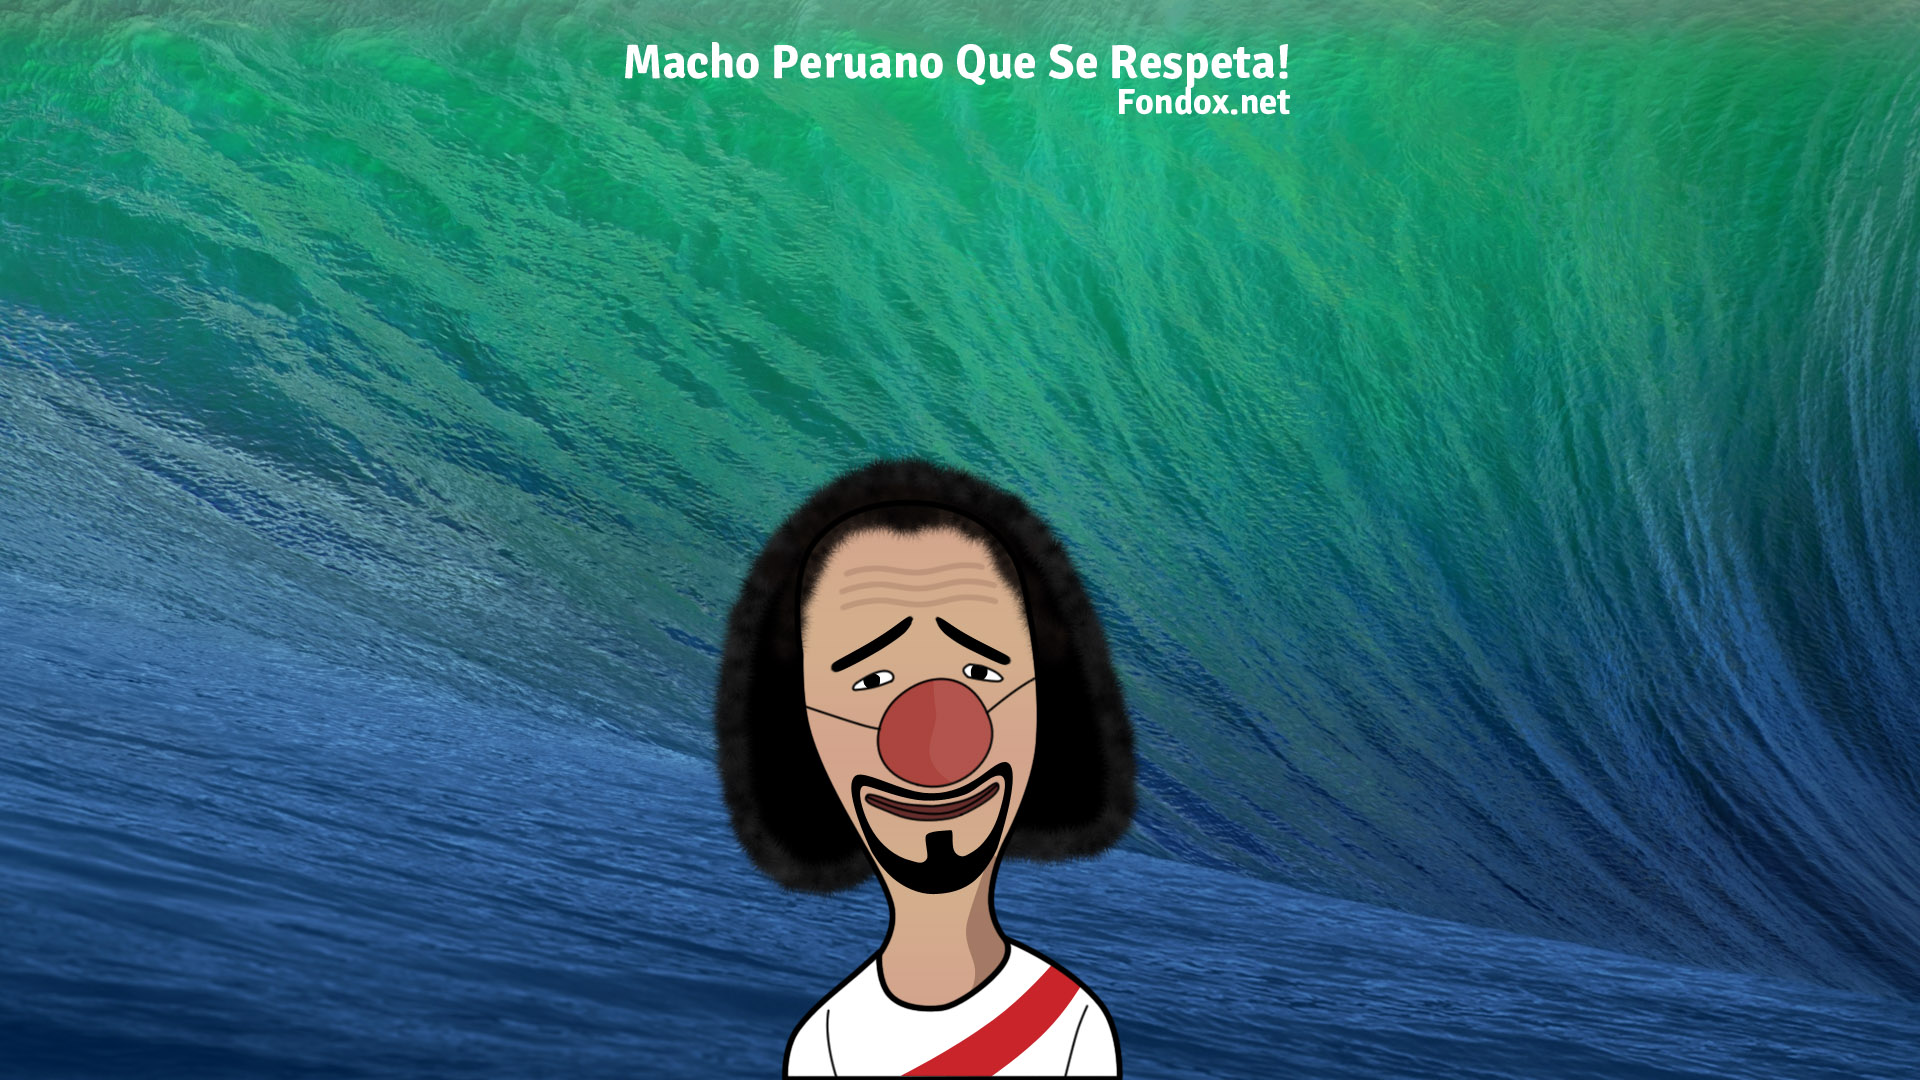 Macho Peruano Que Se Respeta - 1920x1080